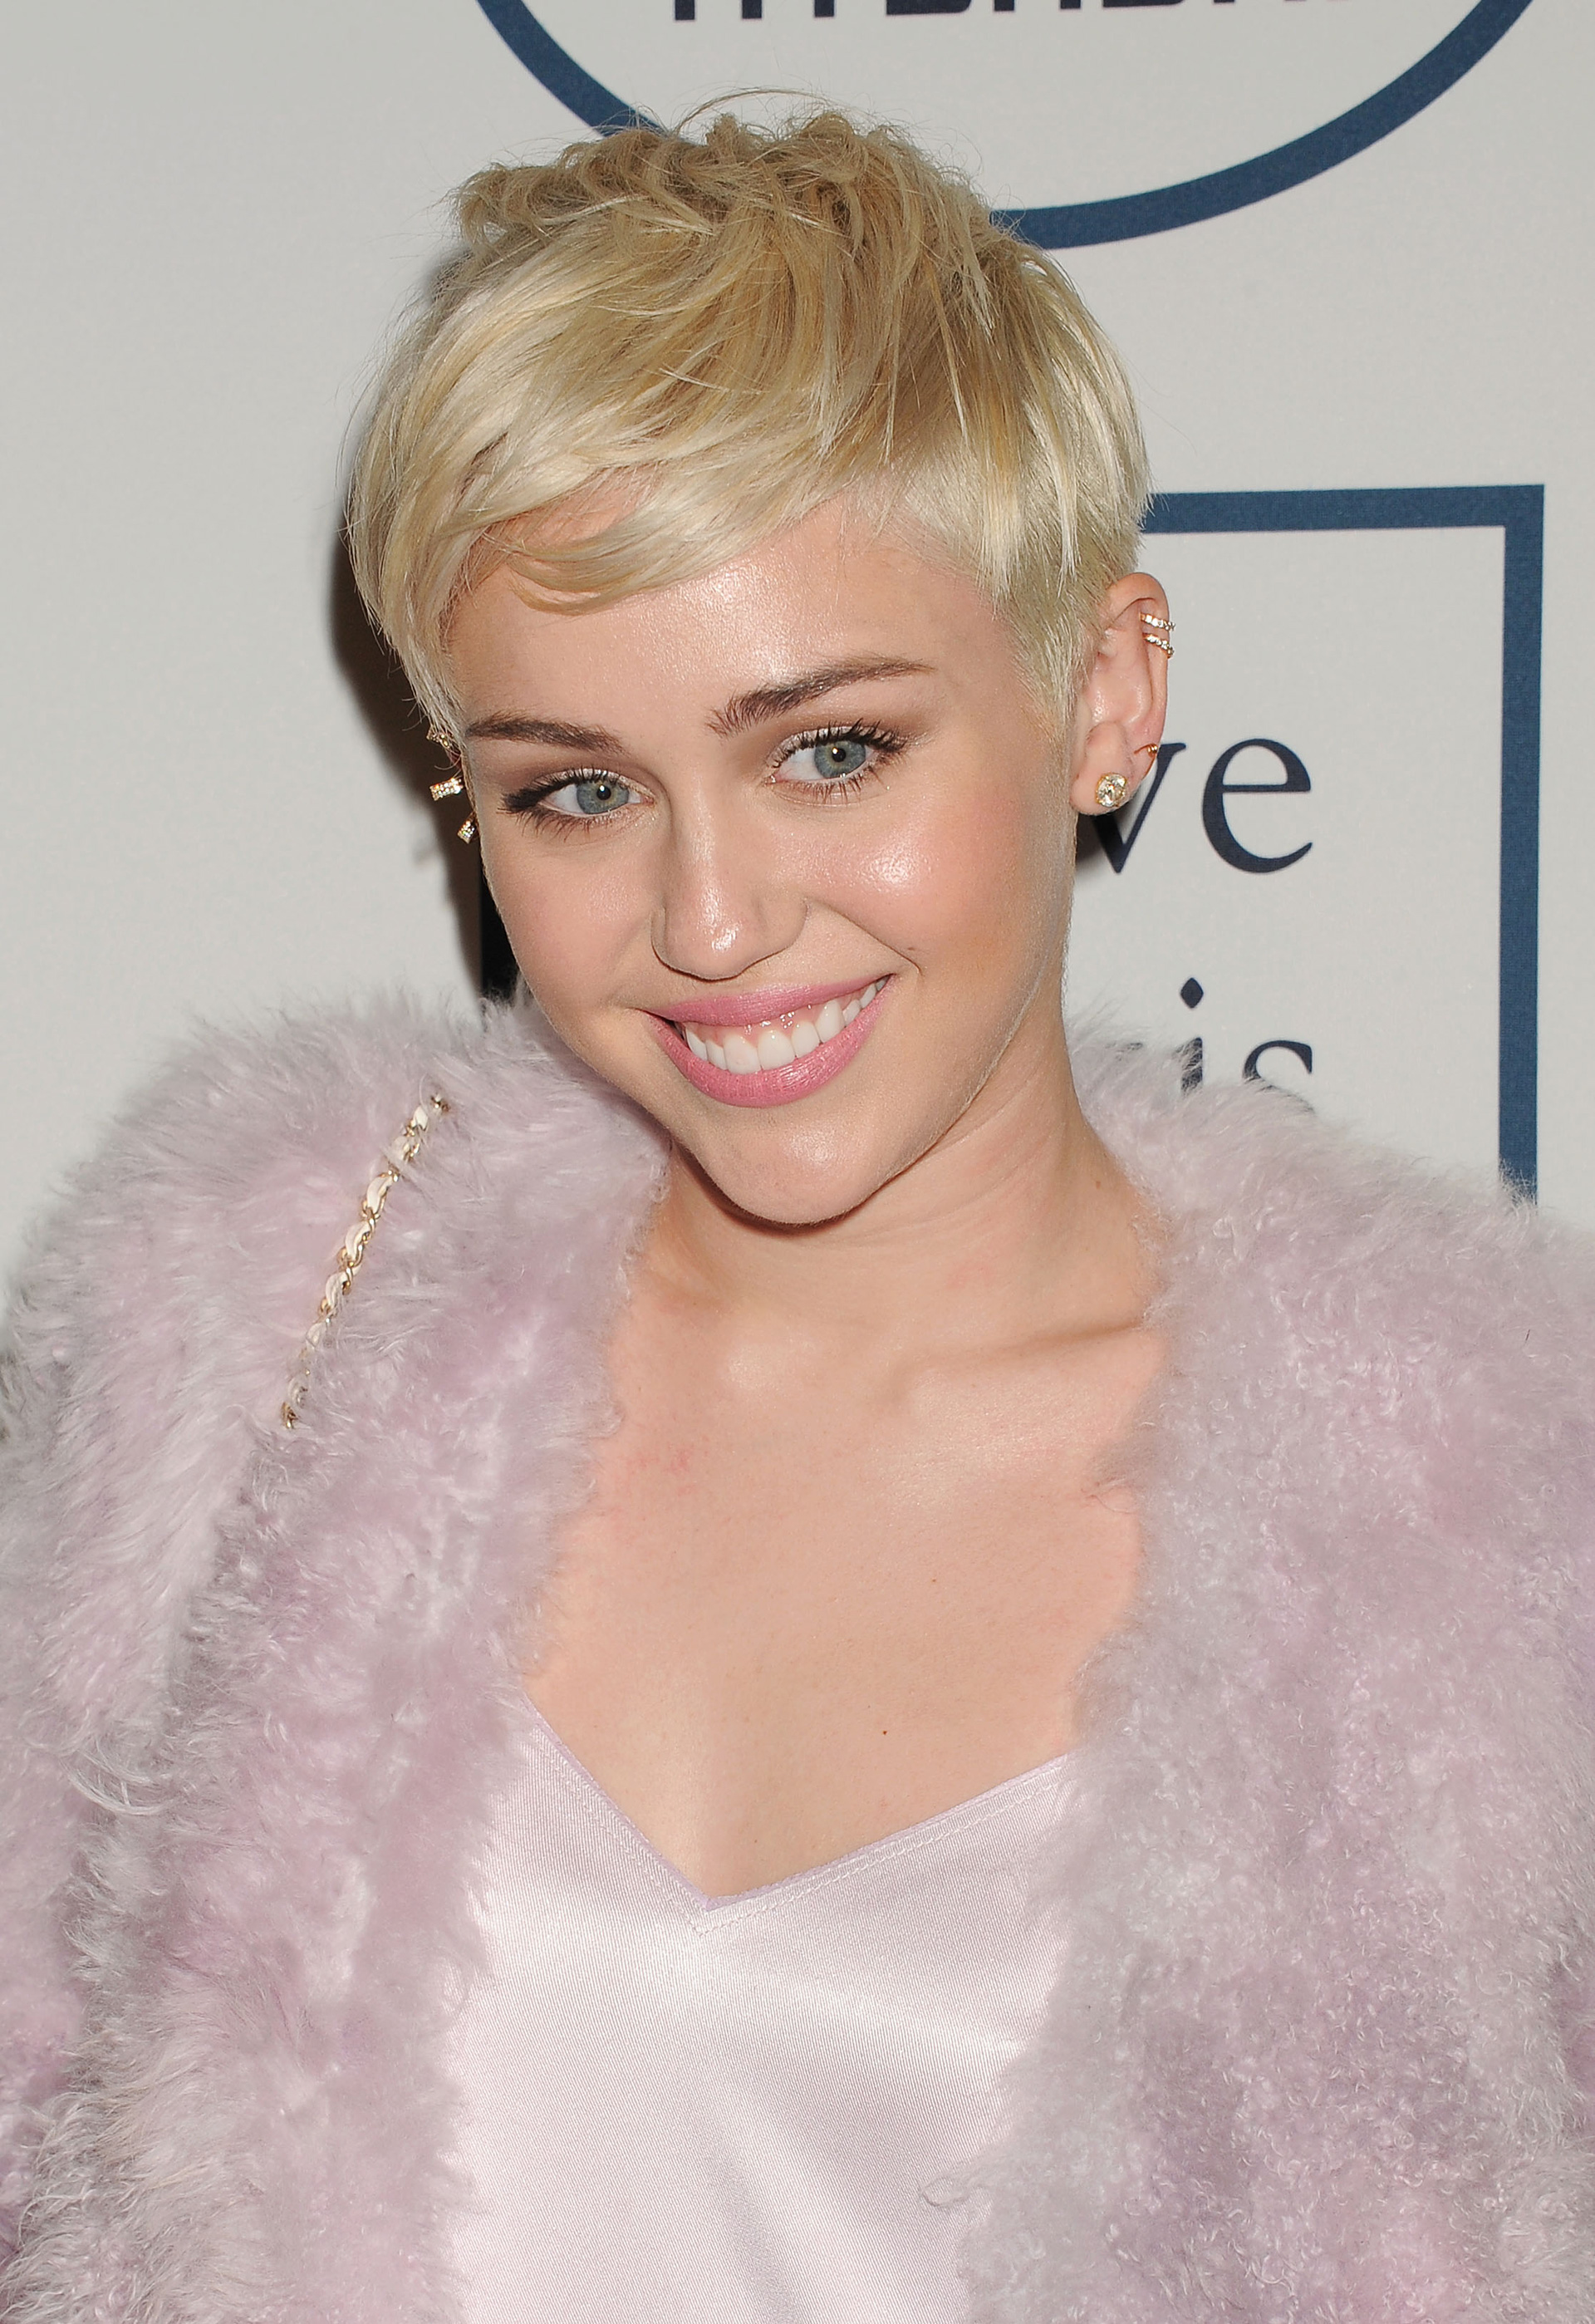 Miley Cyrus' pixie cut